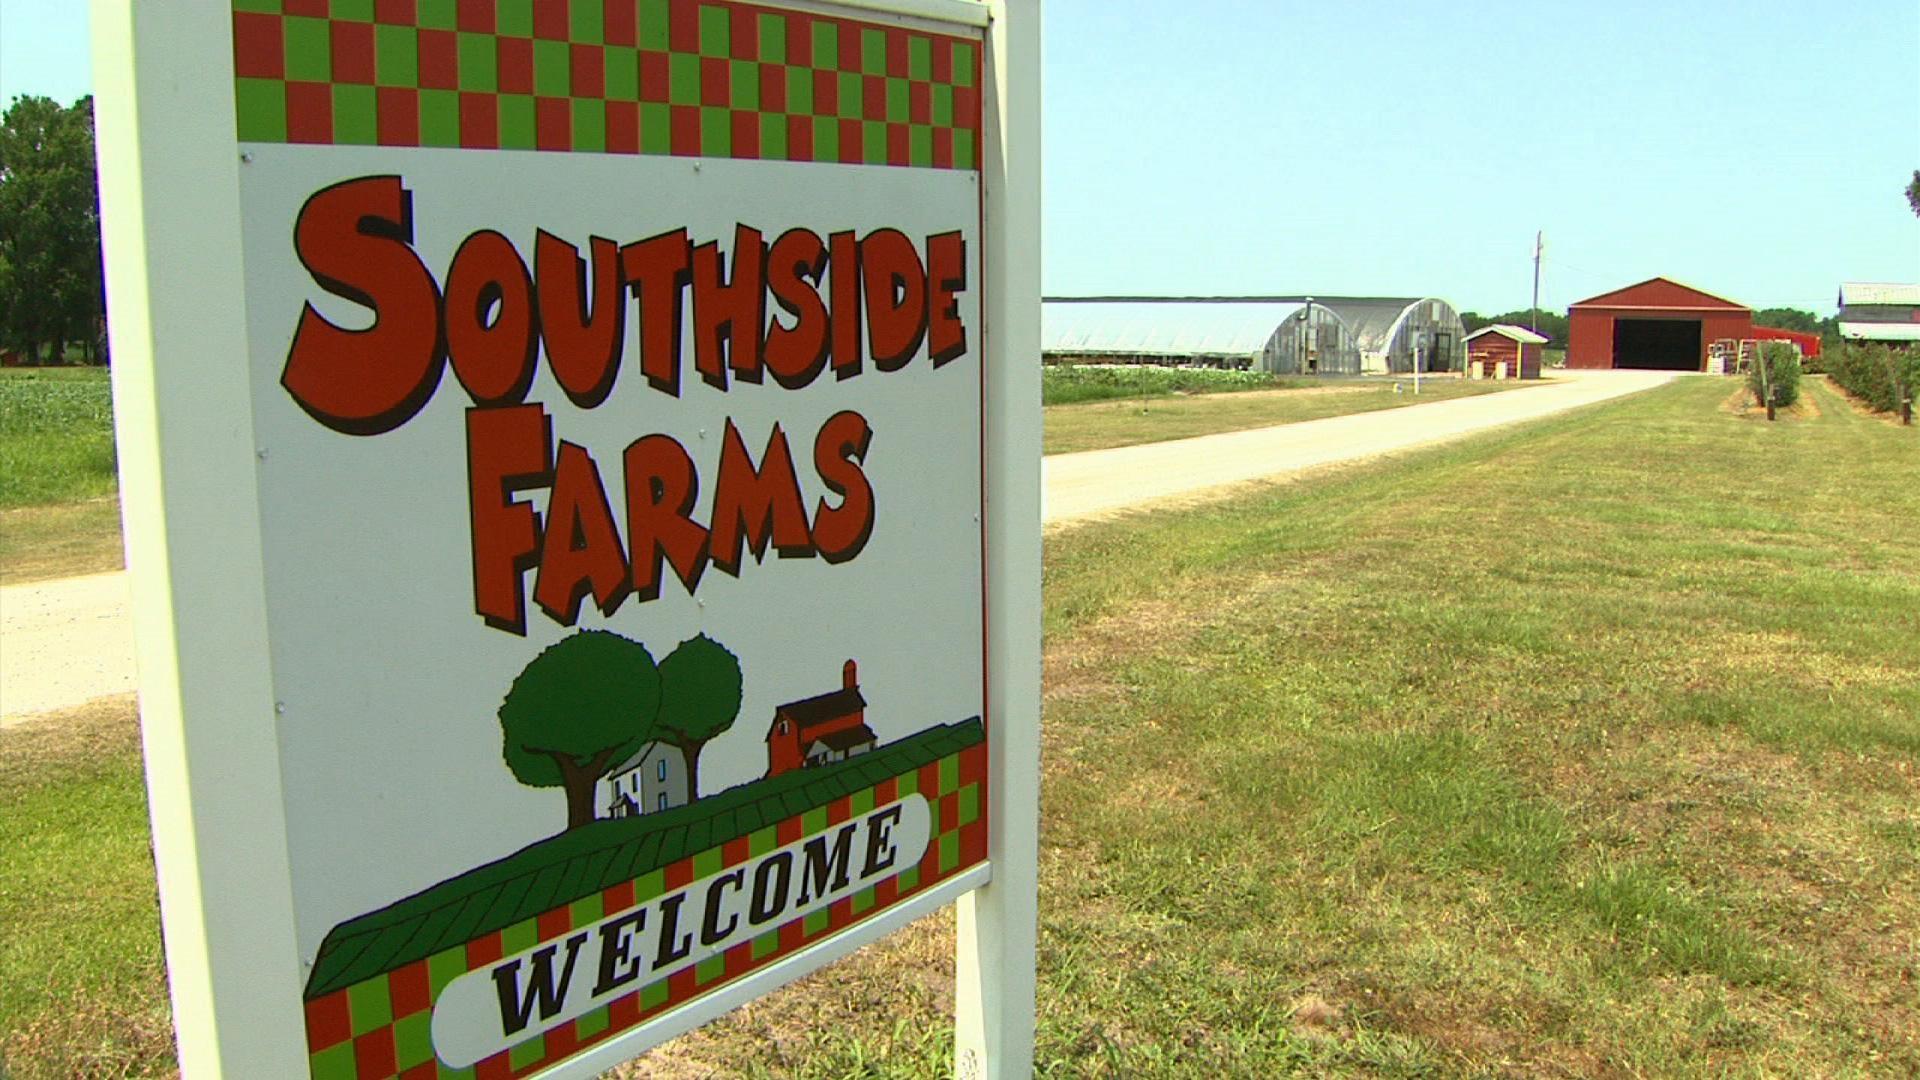 Southside Farms image